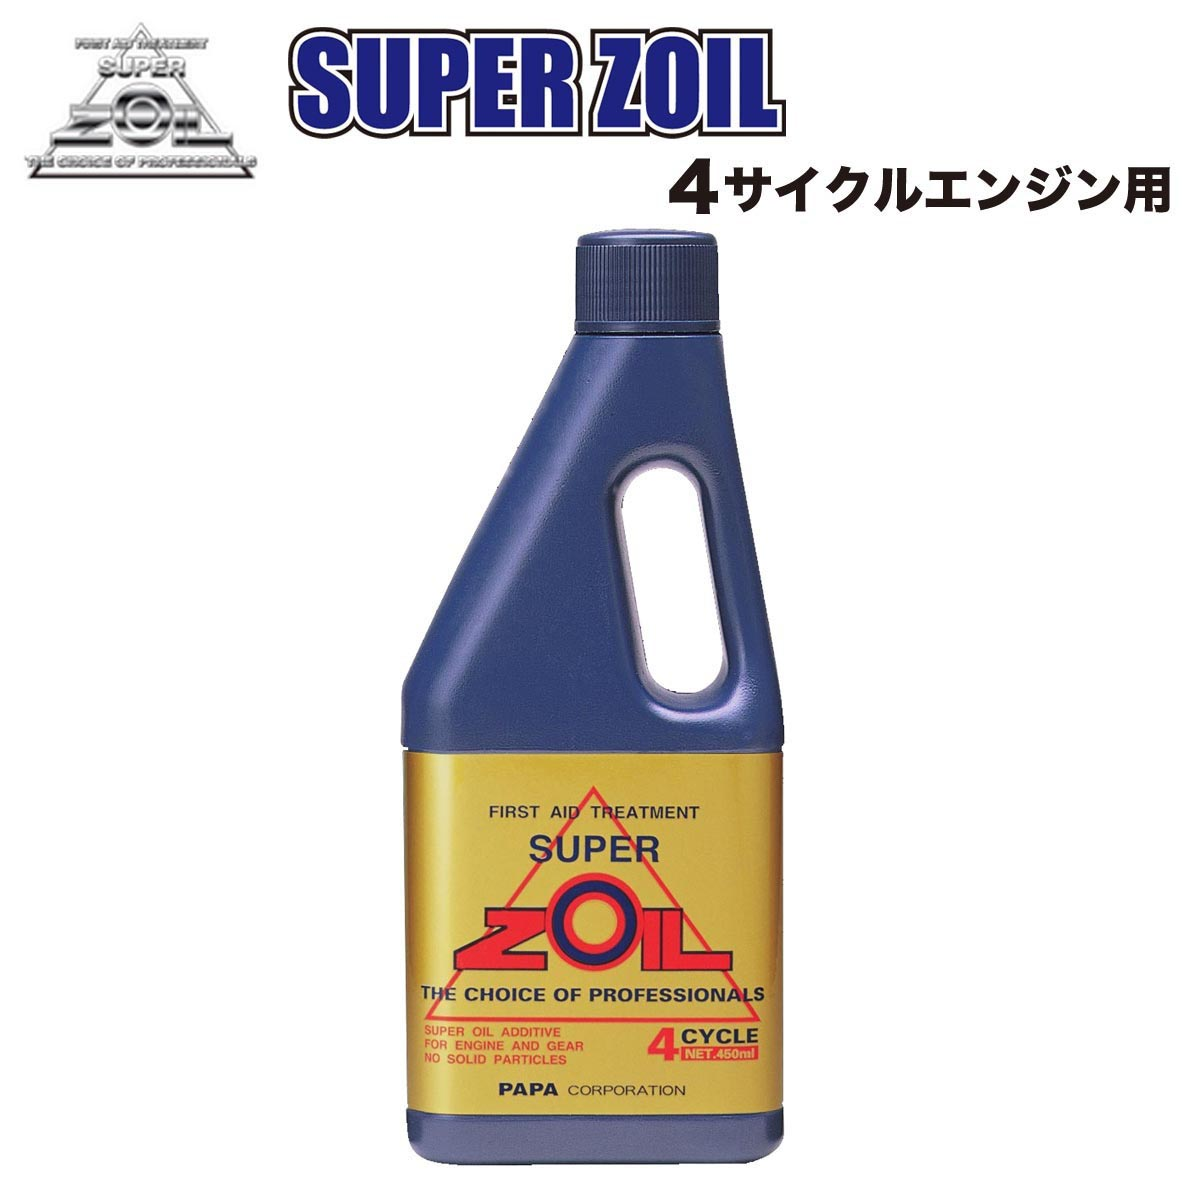 Super ZOIL(スーパーゾイル) 金属表面改質剤 4サイクルエンジン用 450ml